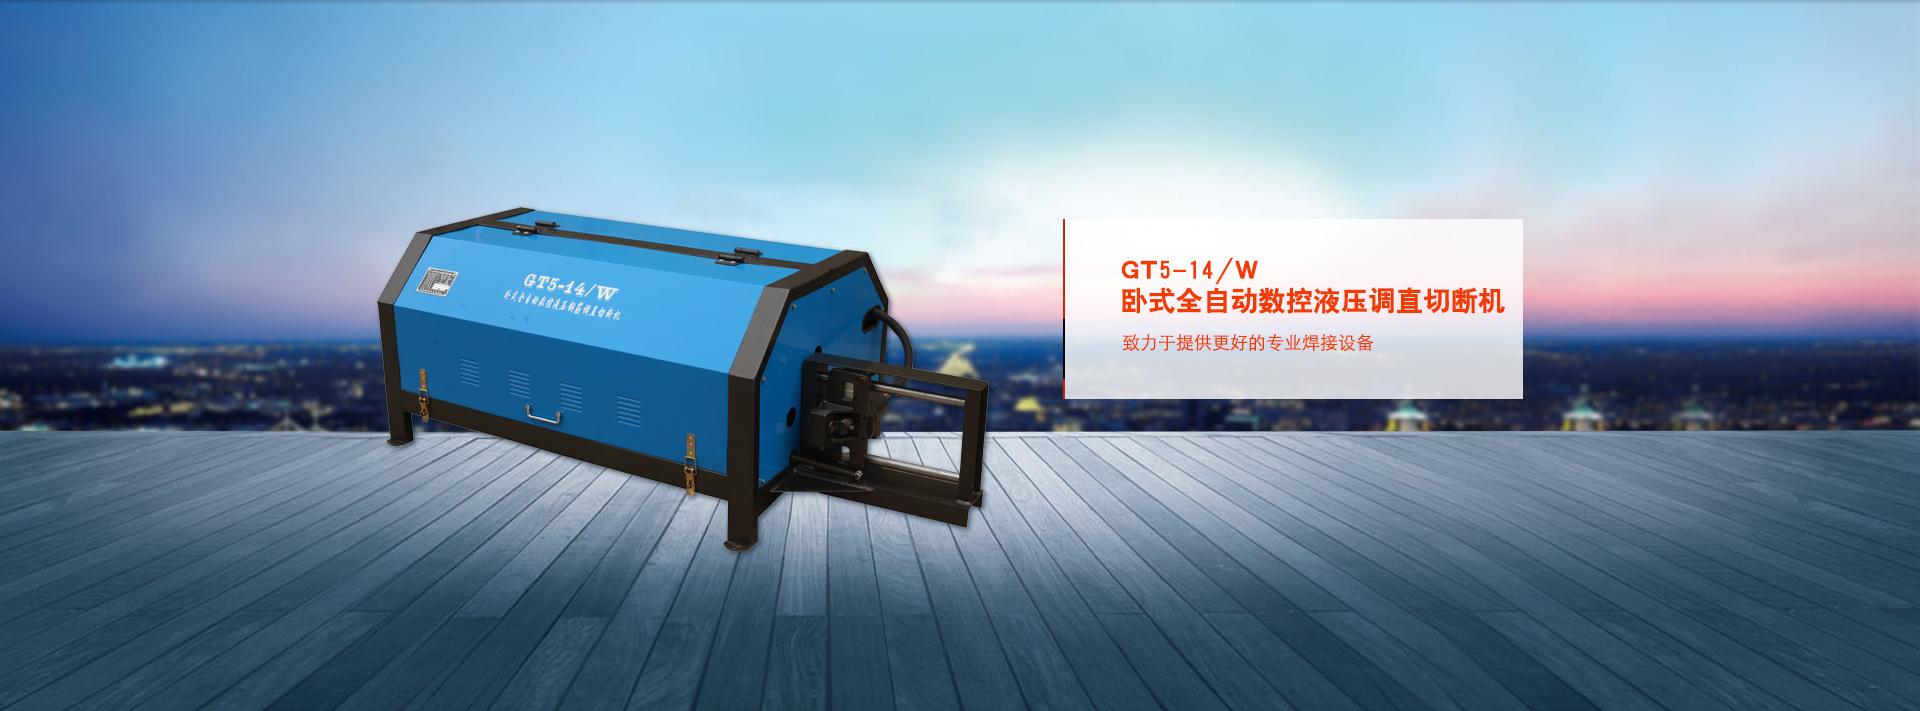 GT5-14/W臥式全自動數控液壓調直切斷機